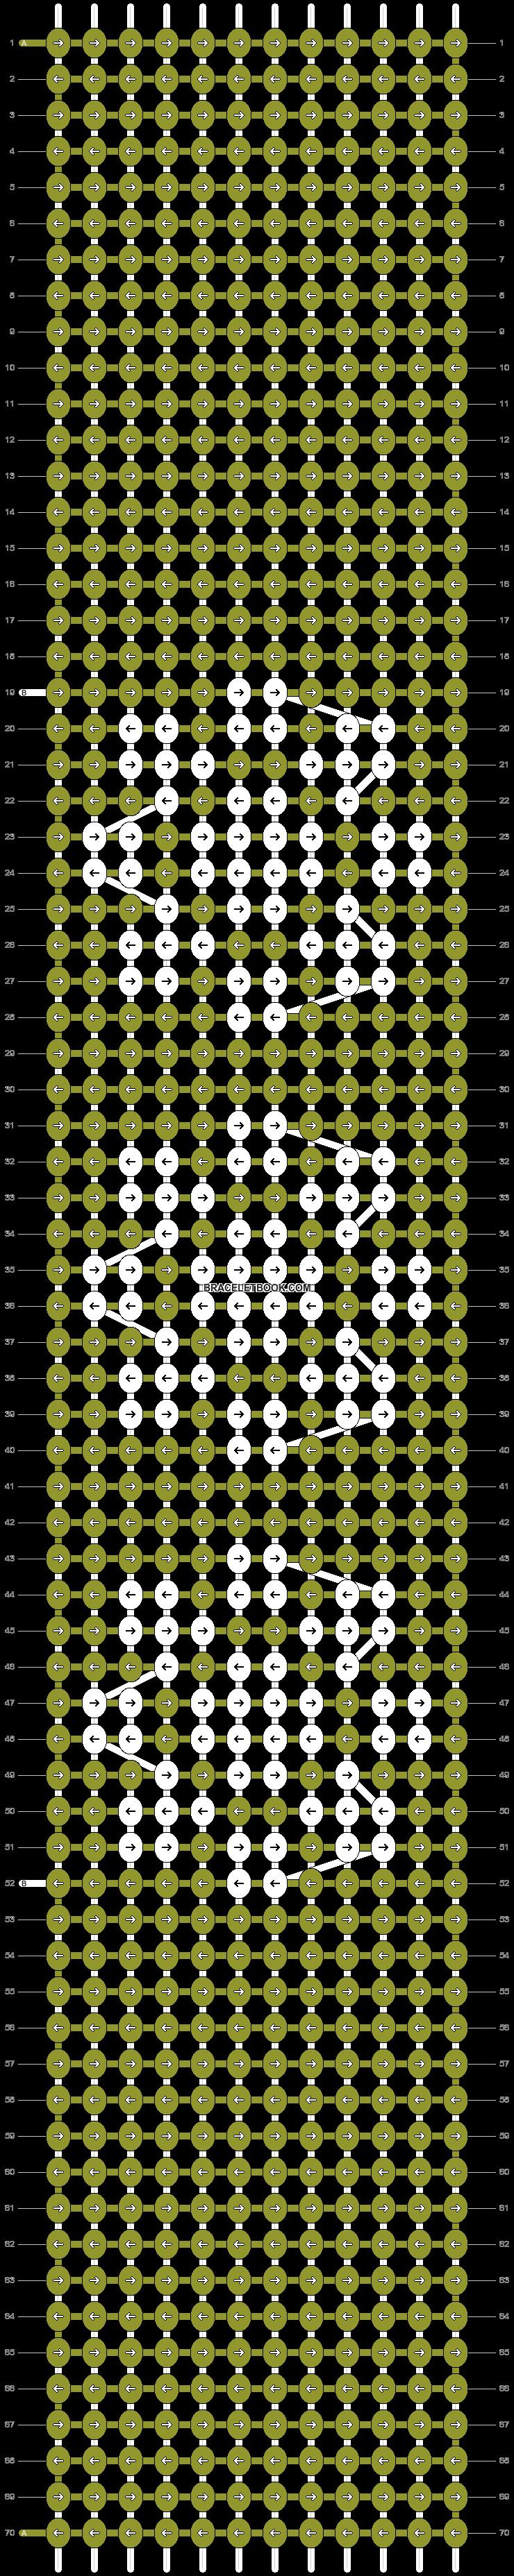 Alpha pattern #80294 variation #160139 pattern